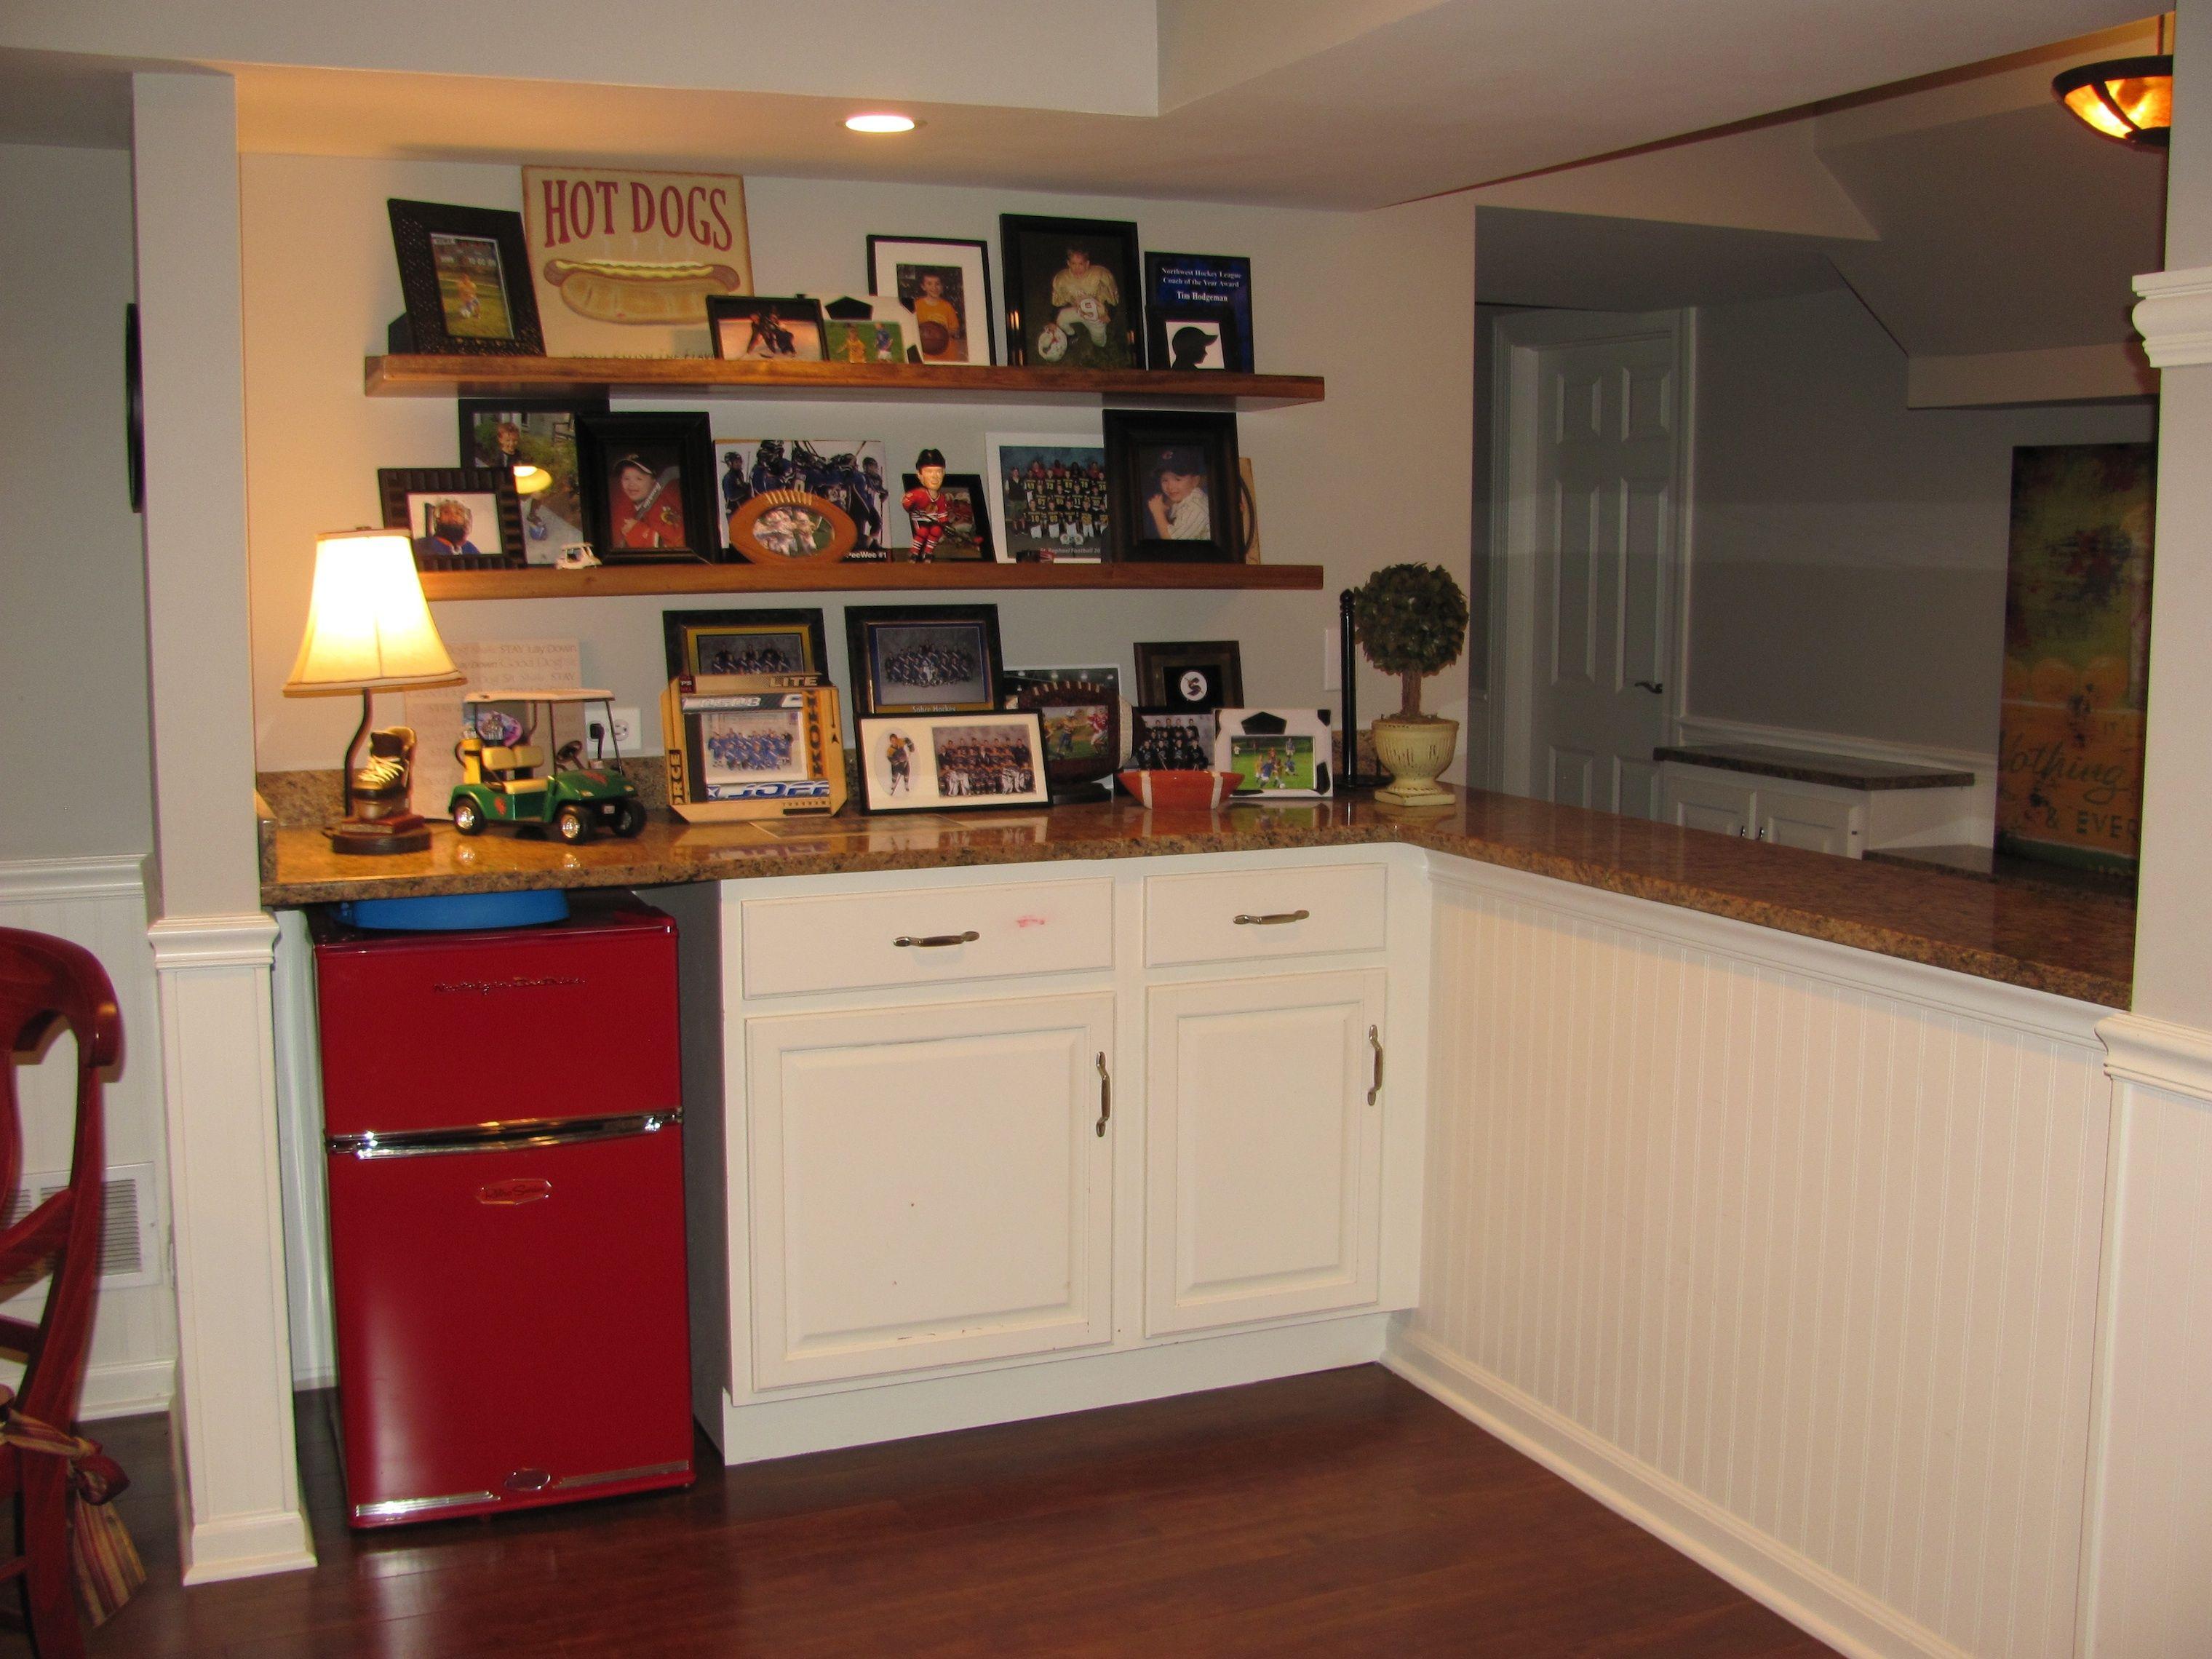 curved home sets bar new basement furniture ideas dark design kitchen stunning